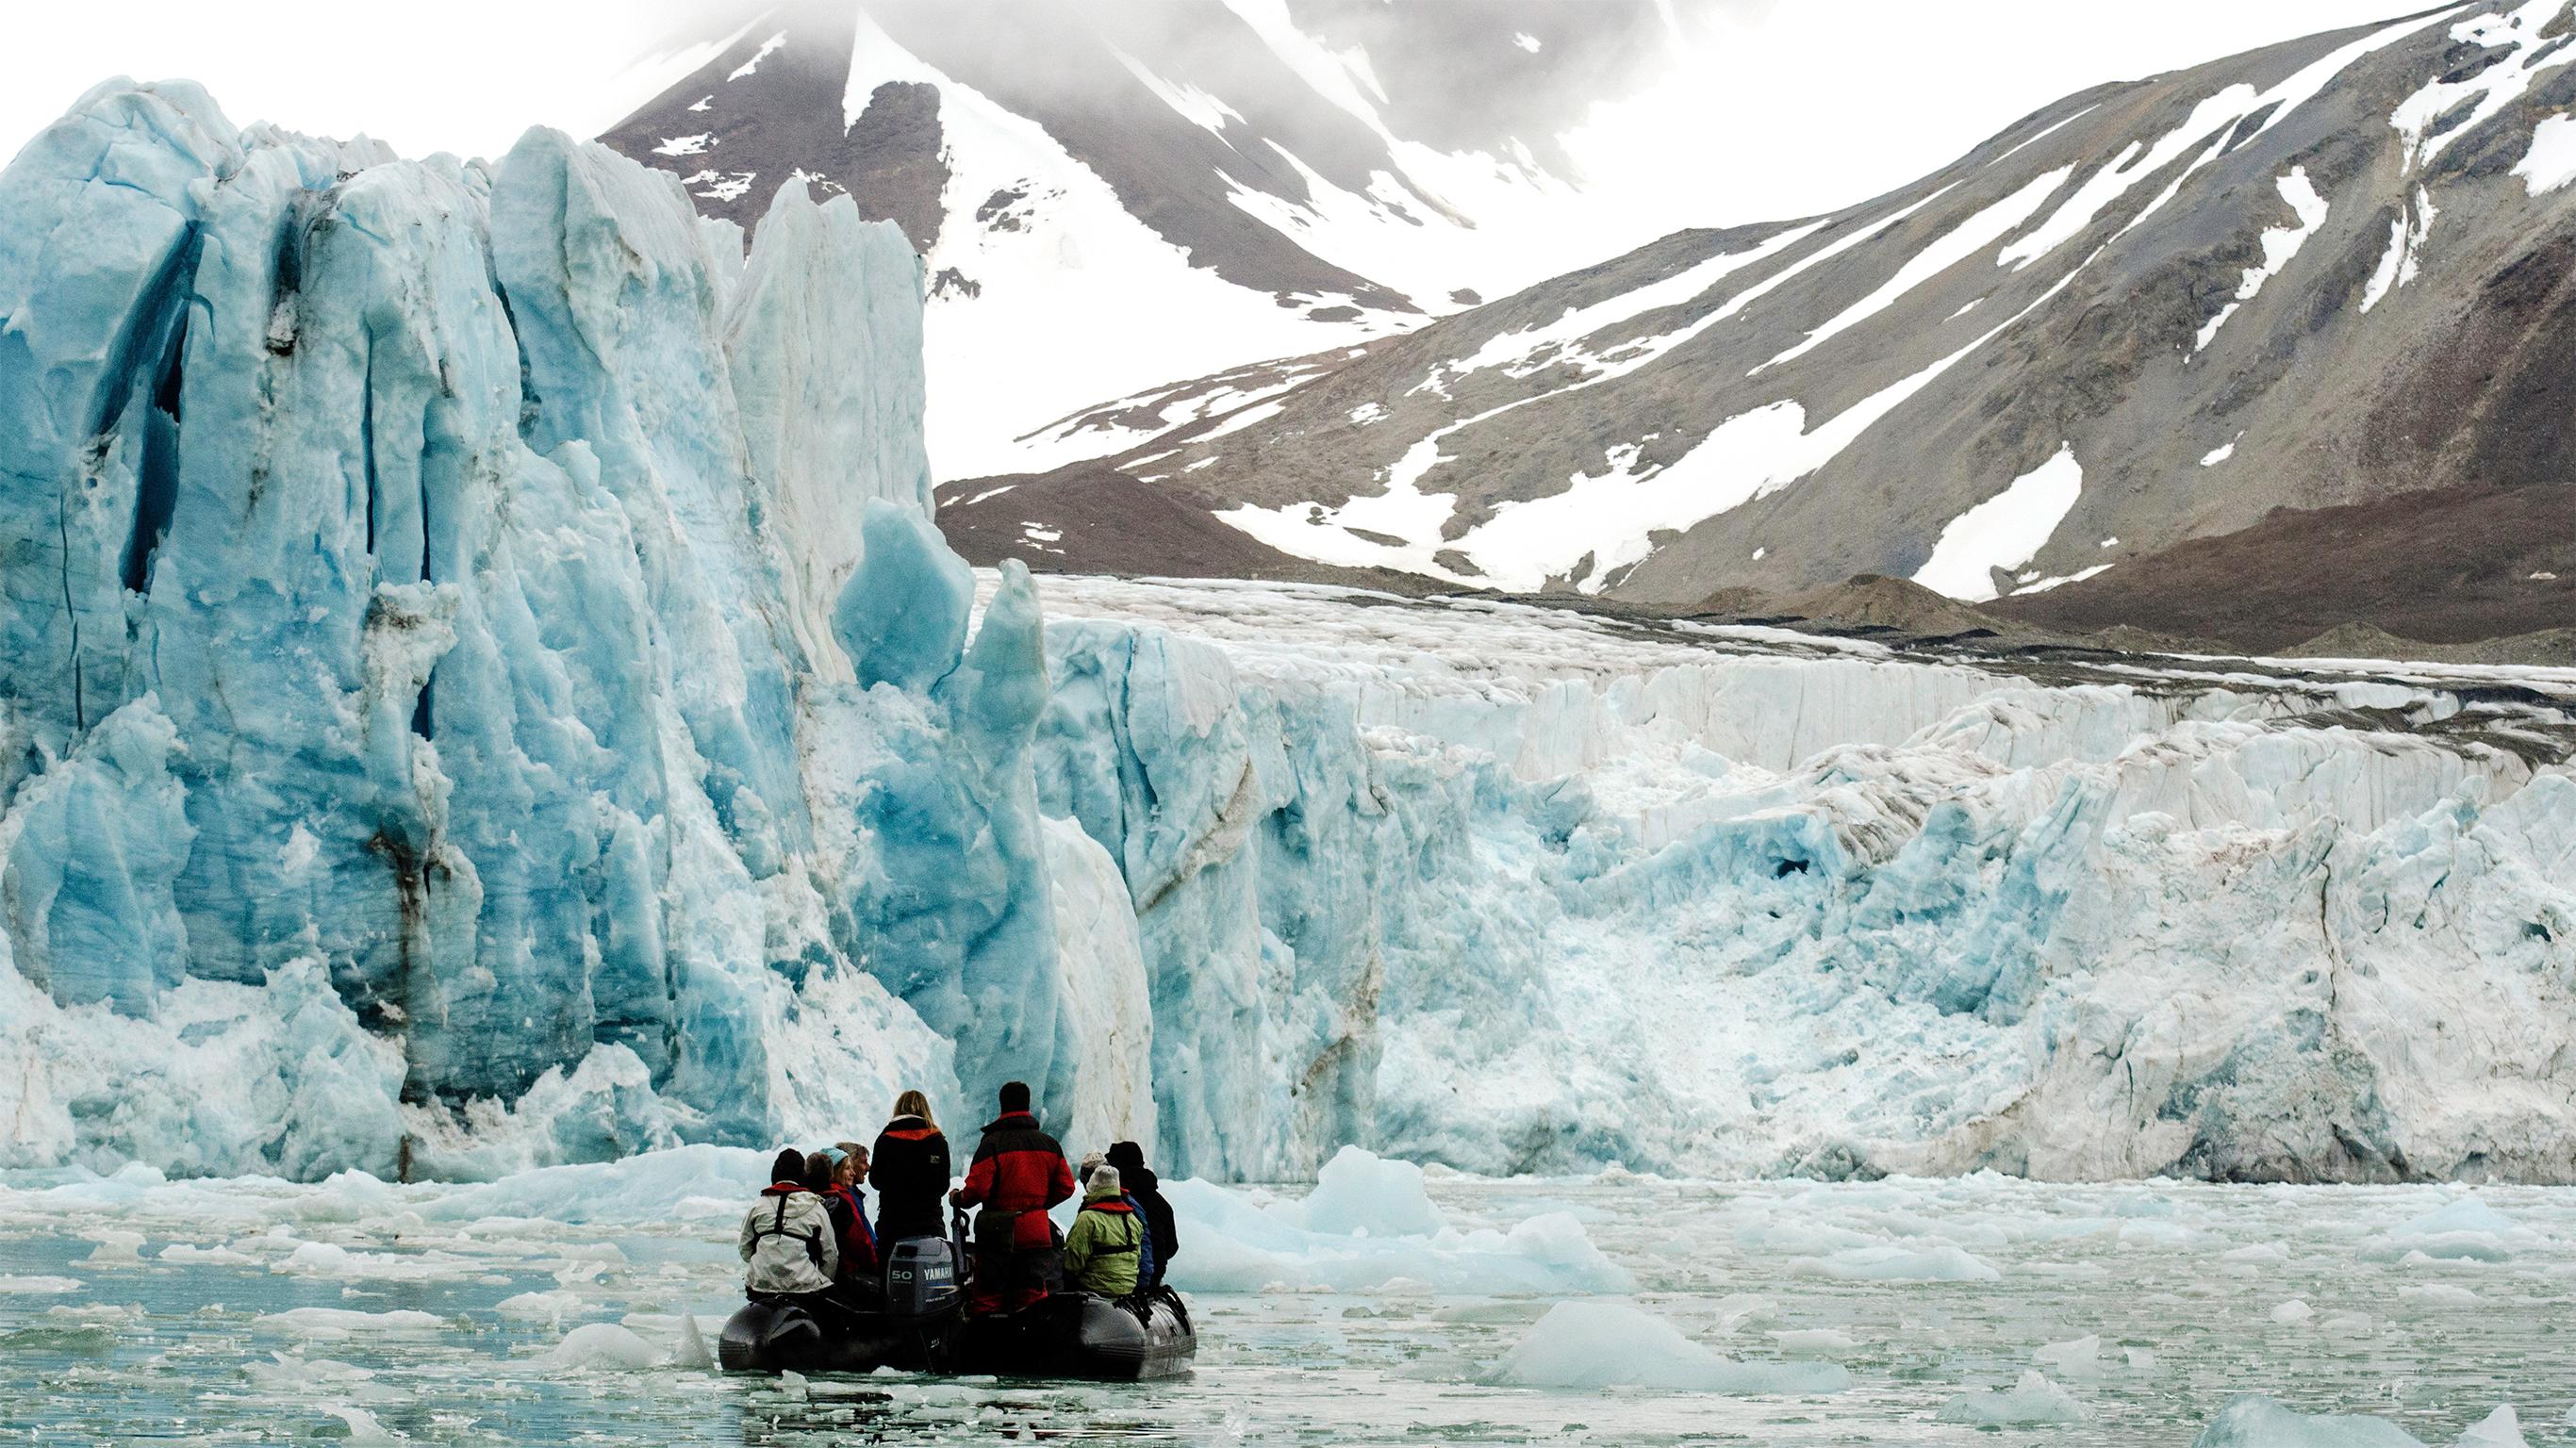 Arquipélago de Svalbard, Noruega